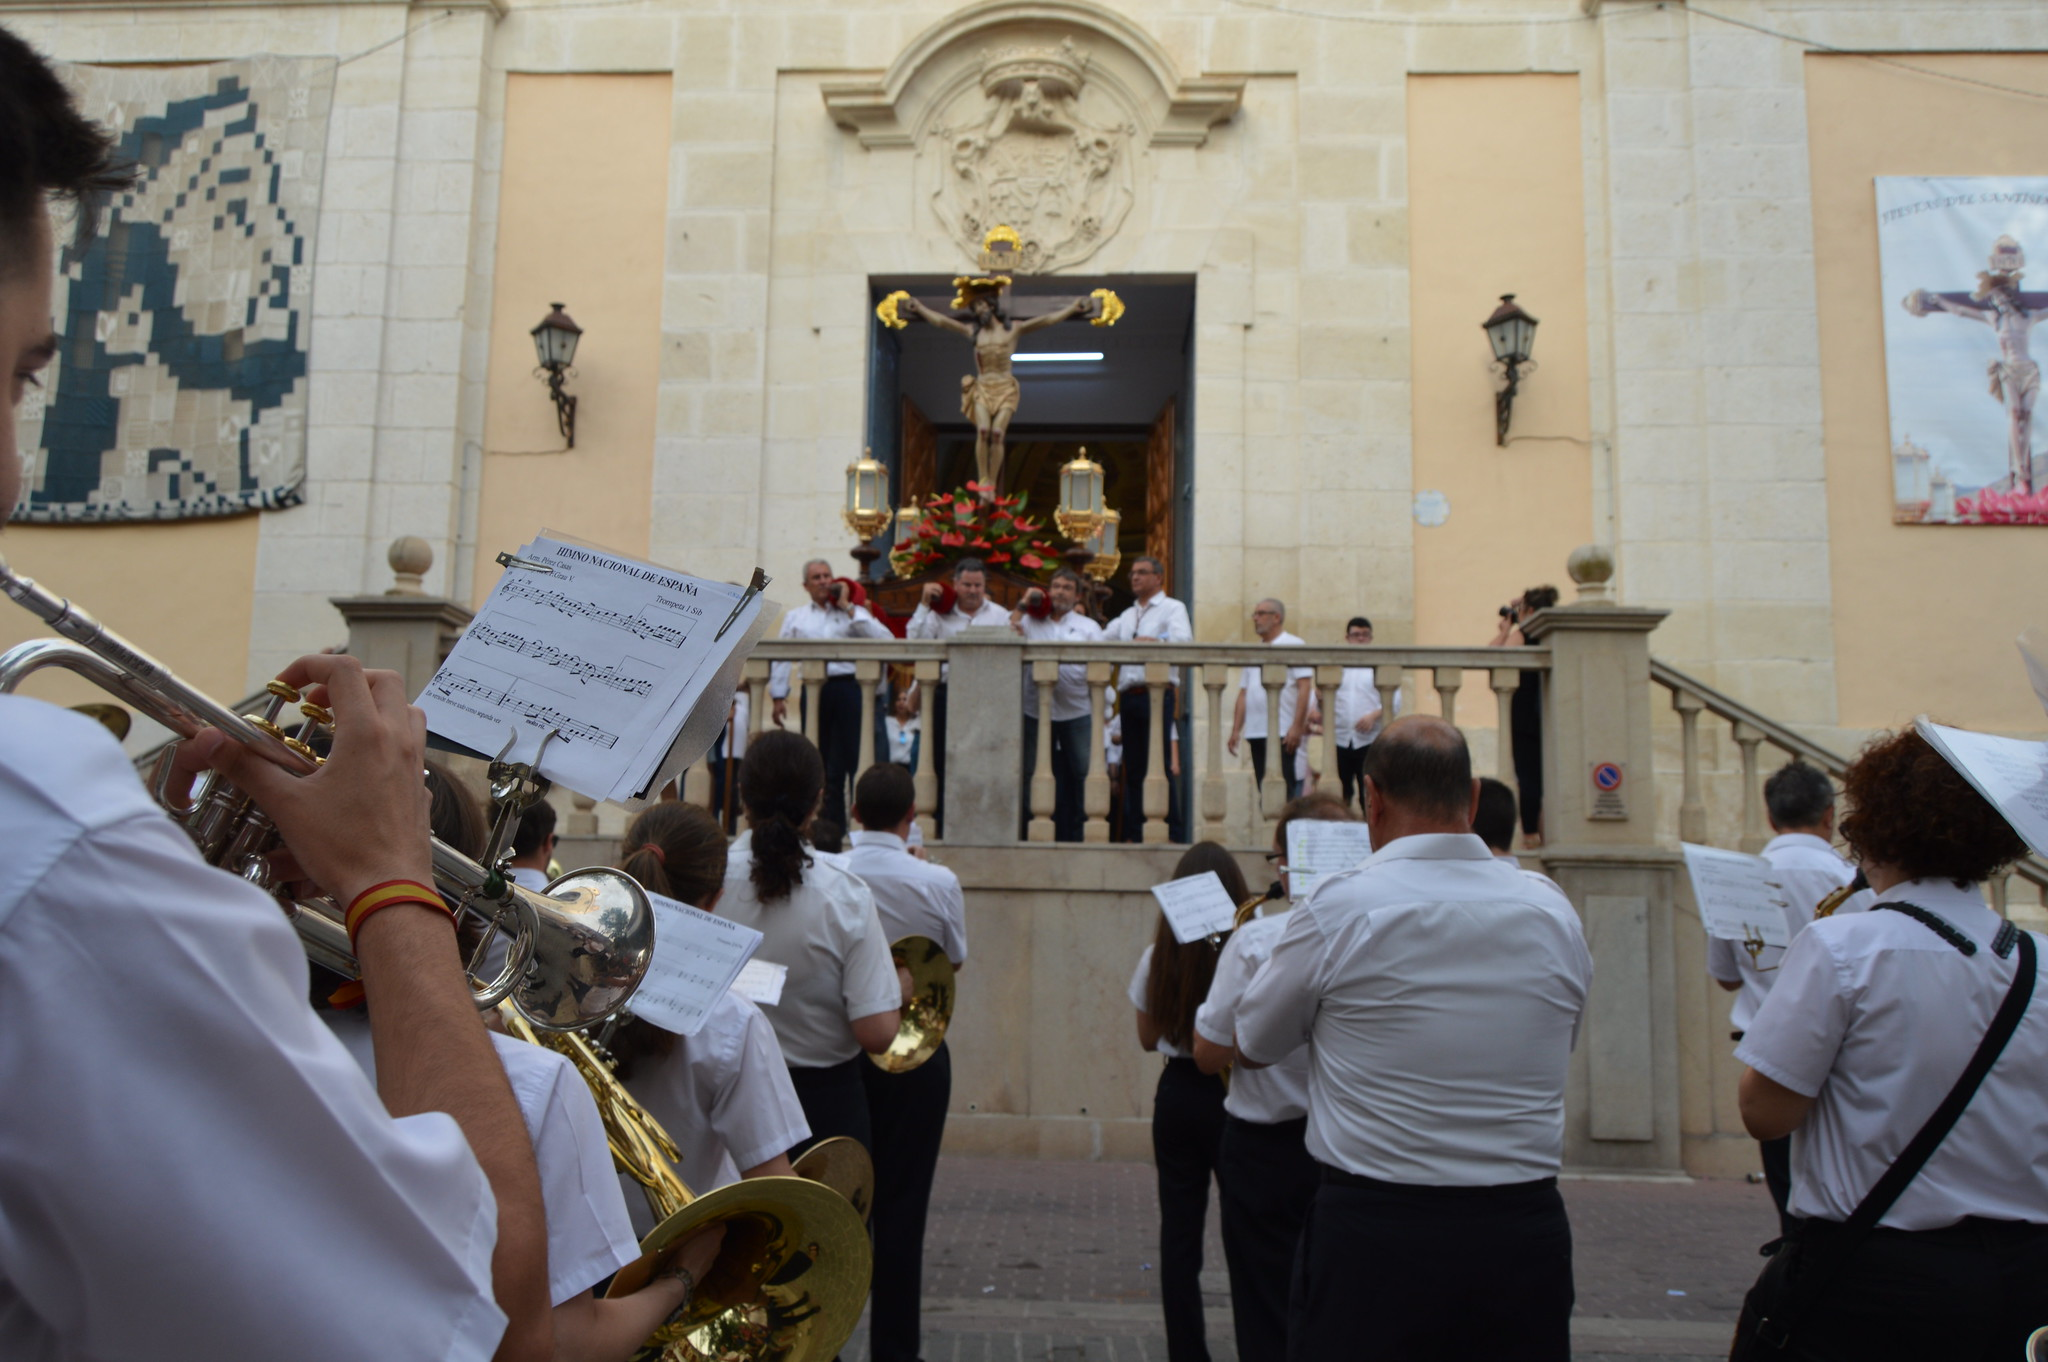 (2019-07-07) Procesión de subida - Adrián Romero Montesinos (01)